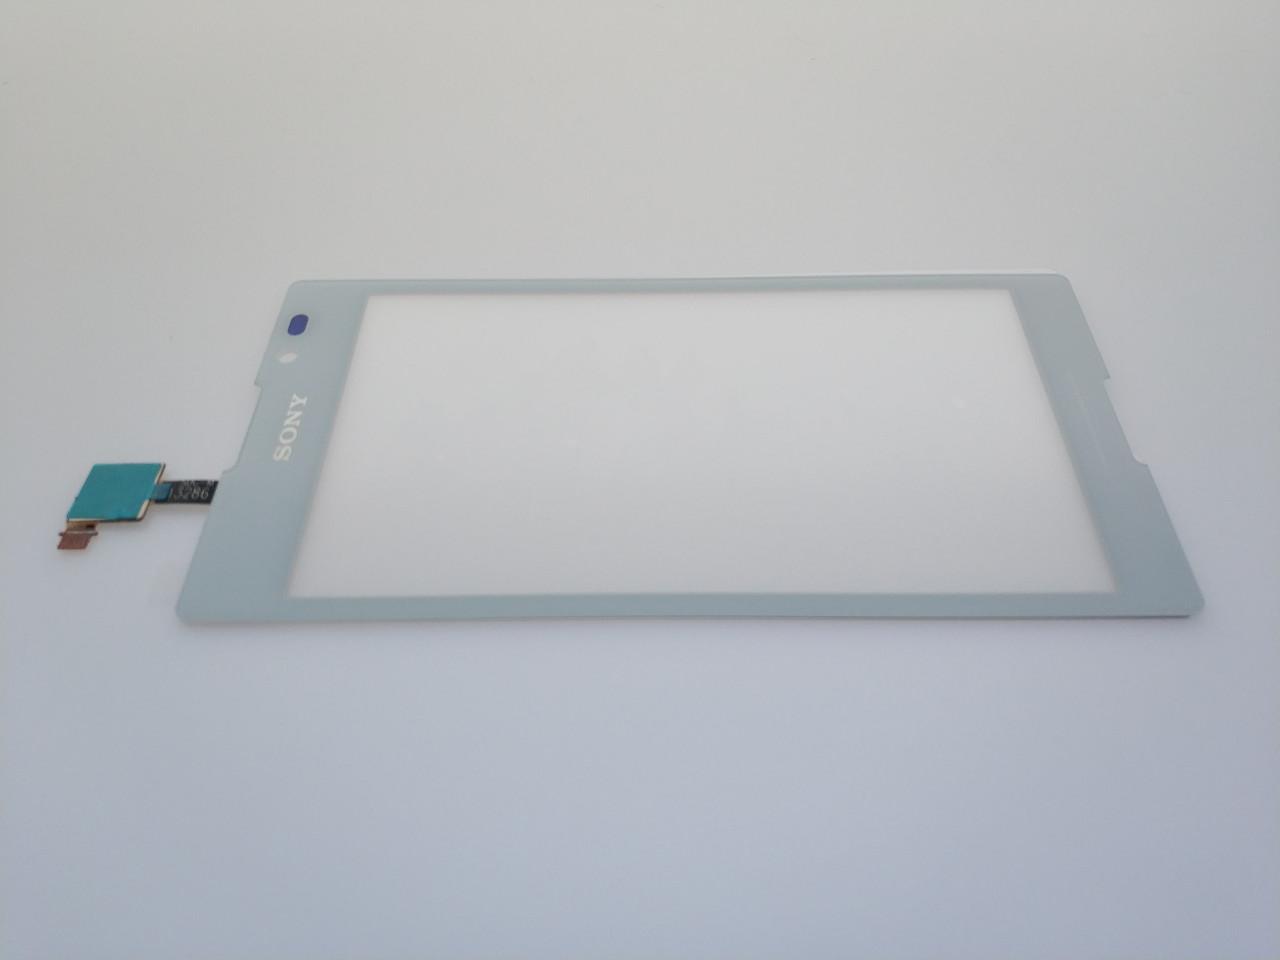 Тачскрин для Sony C2304 Xperia C Тачскрин для Sony C2305 Xperia C белы